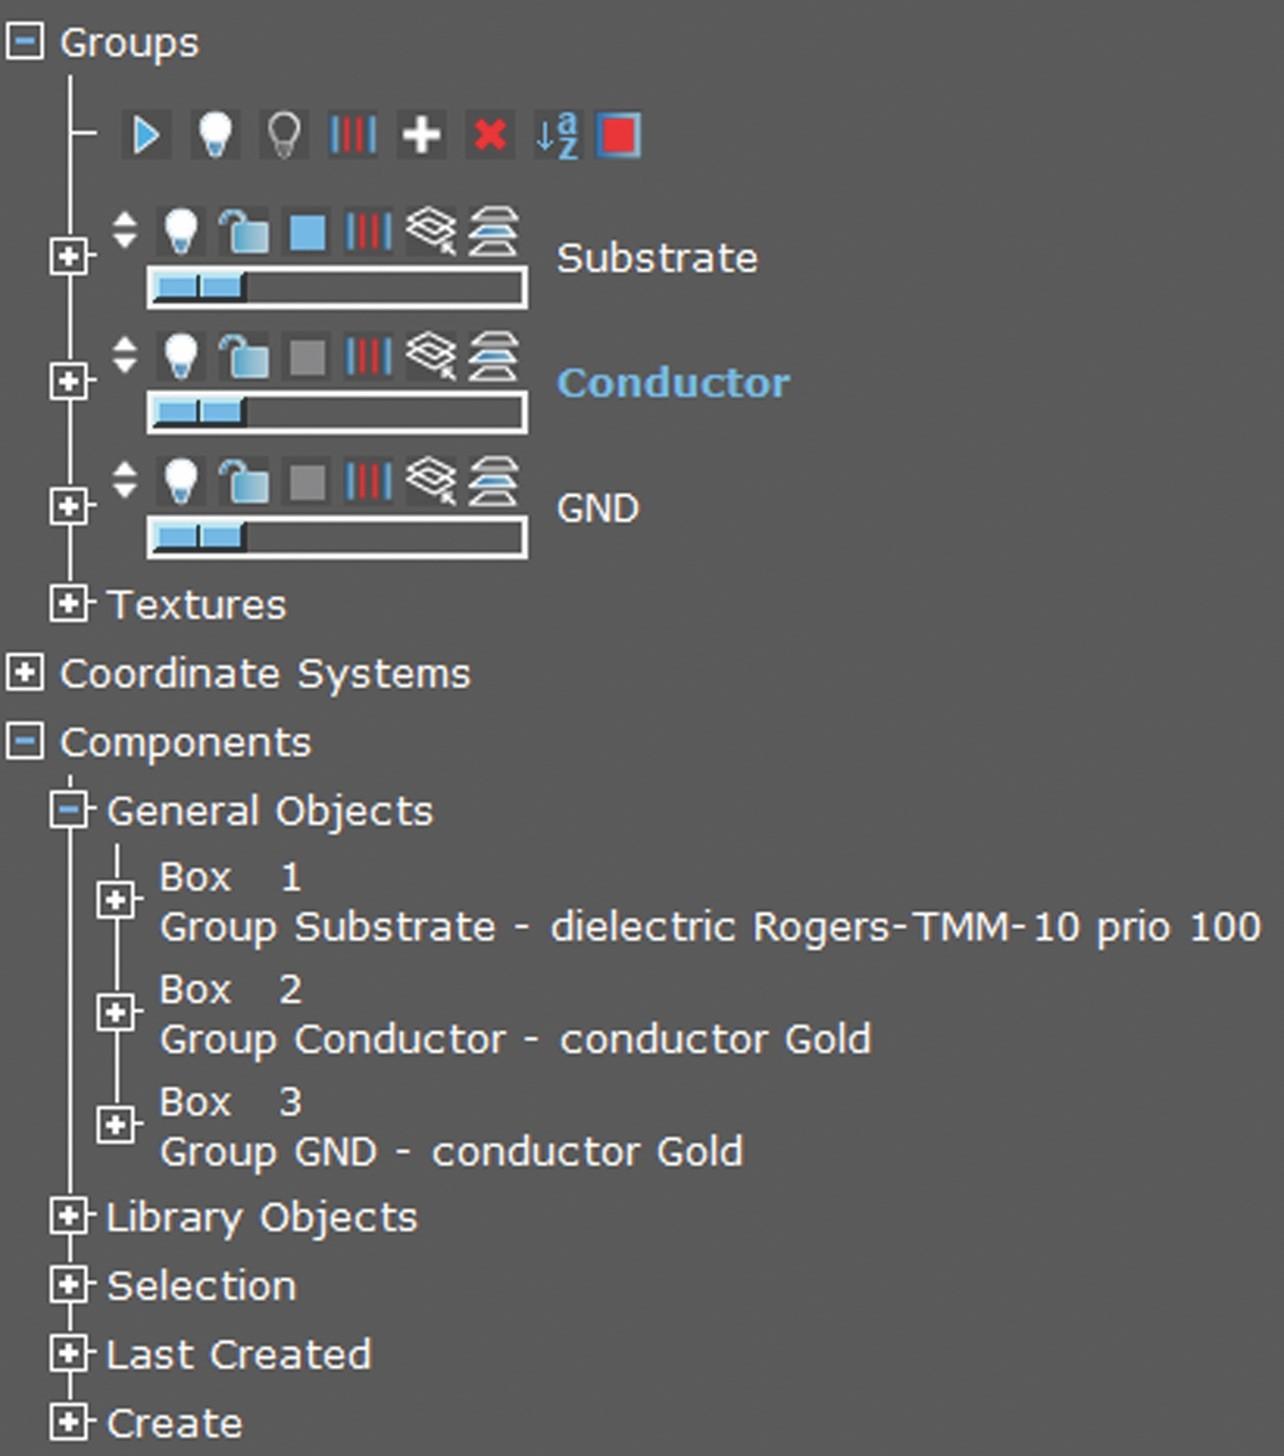 Пример списка групп Substrate, Conductor и GND